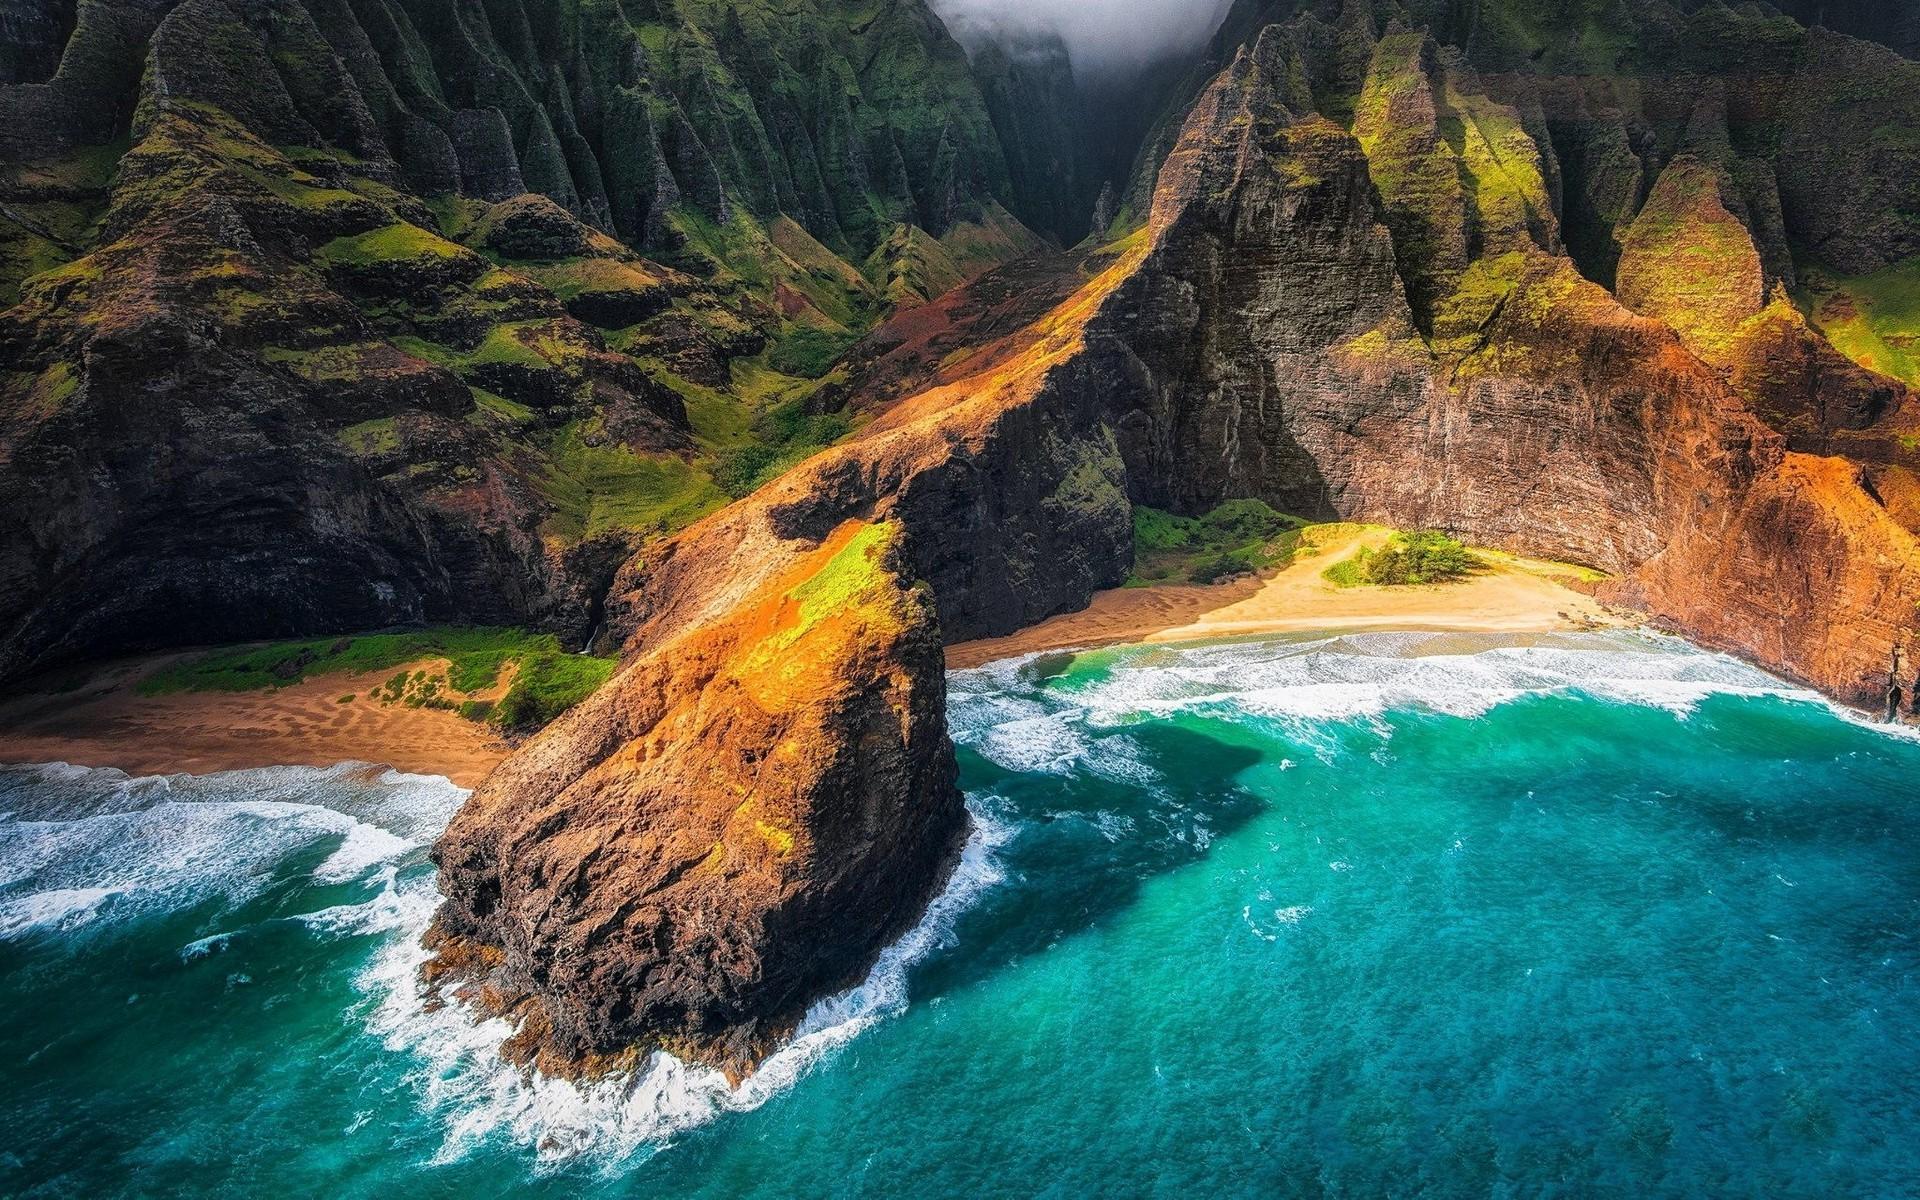 landscape, Nature, Kauai, Hawaii, Beach, Cliff, Sea, Mountain, Coast,  Aerial View Wallpapers HD / Desktop and Mobile Backgrounds